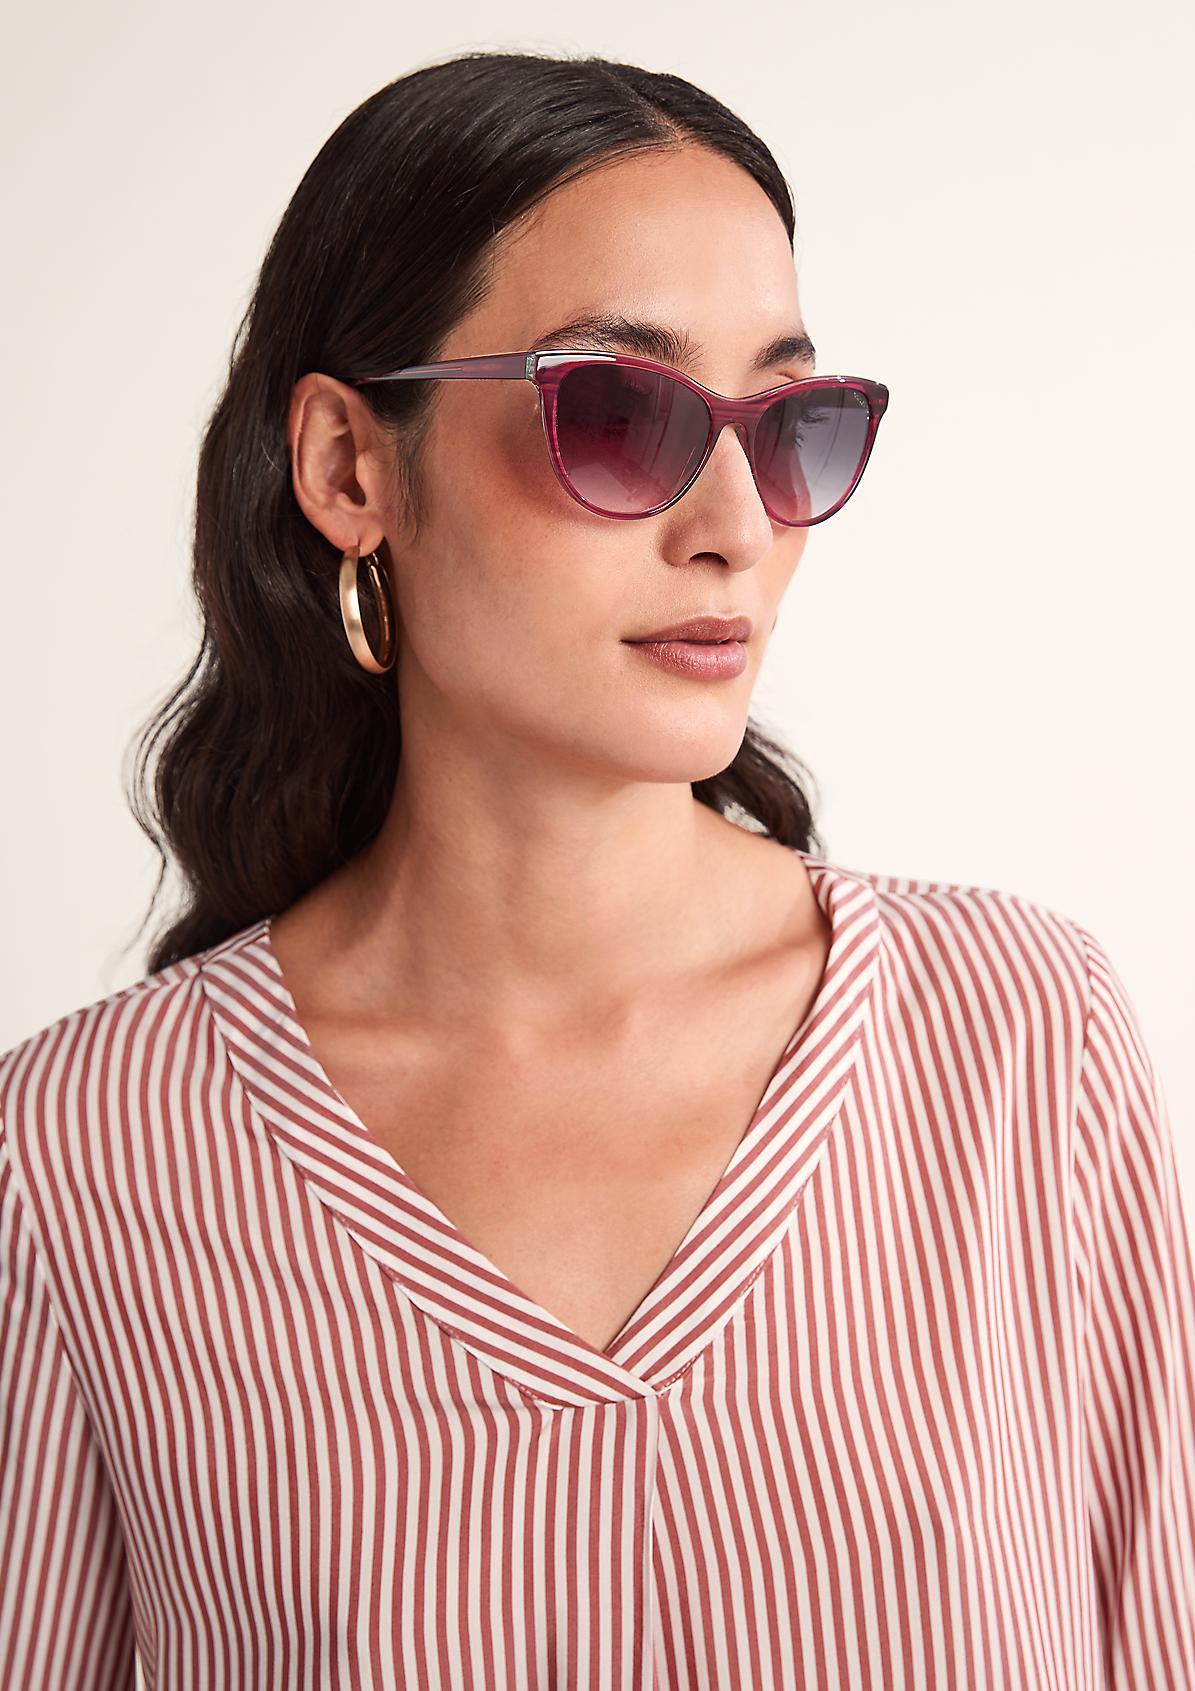 Sonnenbrille in eleganter Form